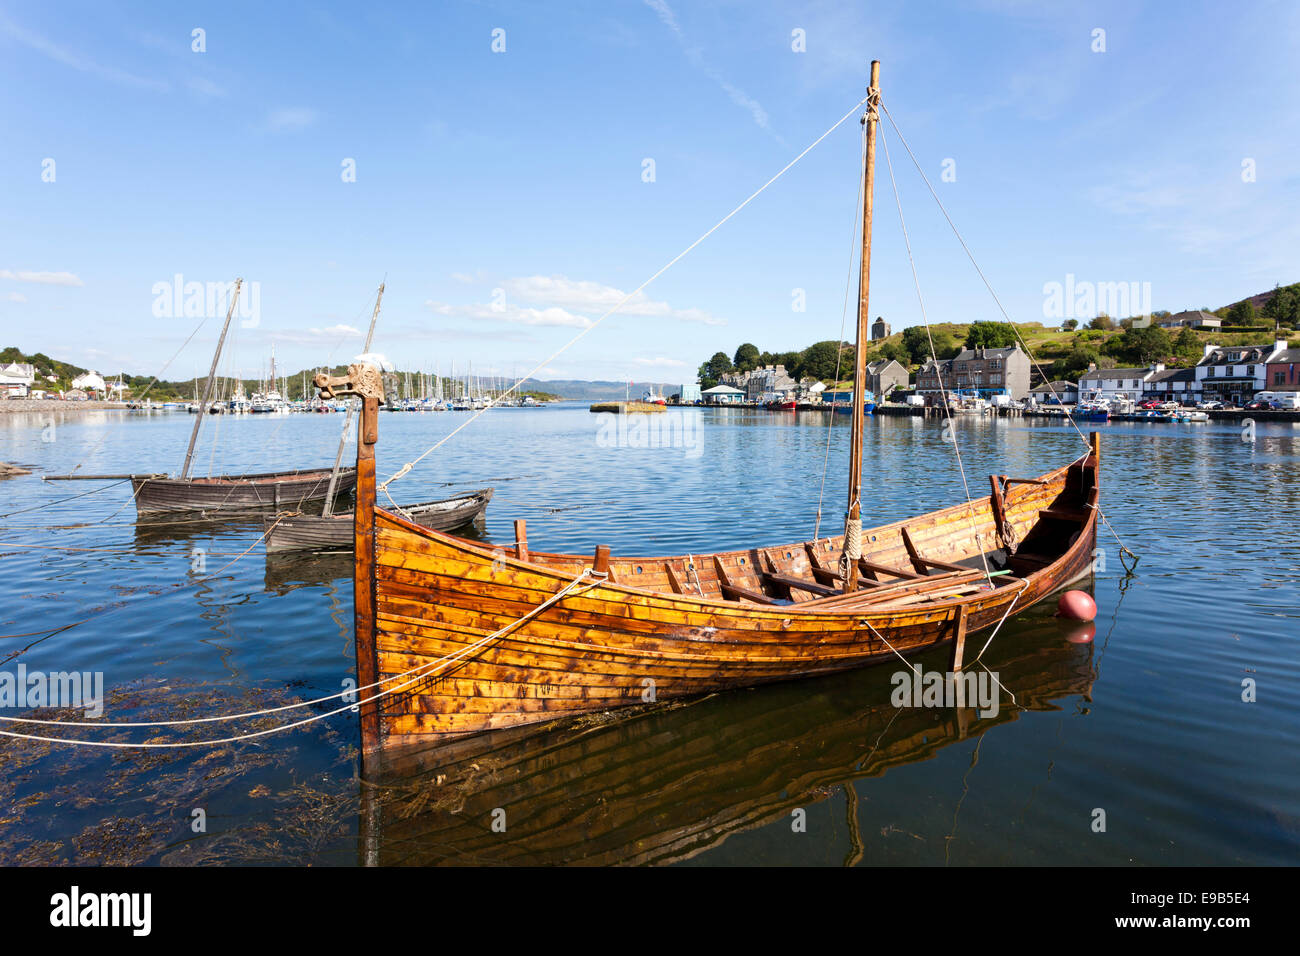 A Viking longboat, built locally for the first Loch Fyne Viking festival, Tarbert, Argyll & Bute, Scotland UK Stock Photo